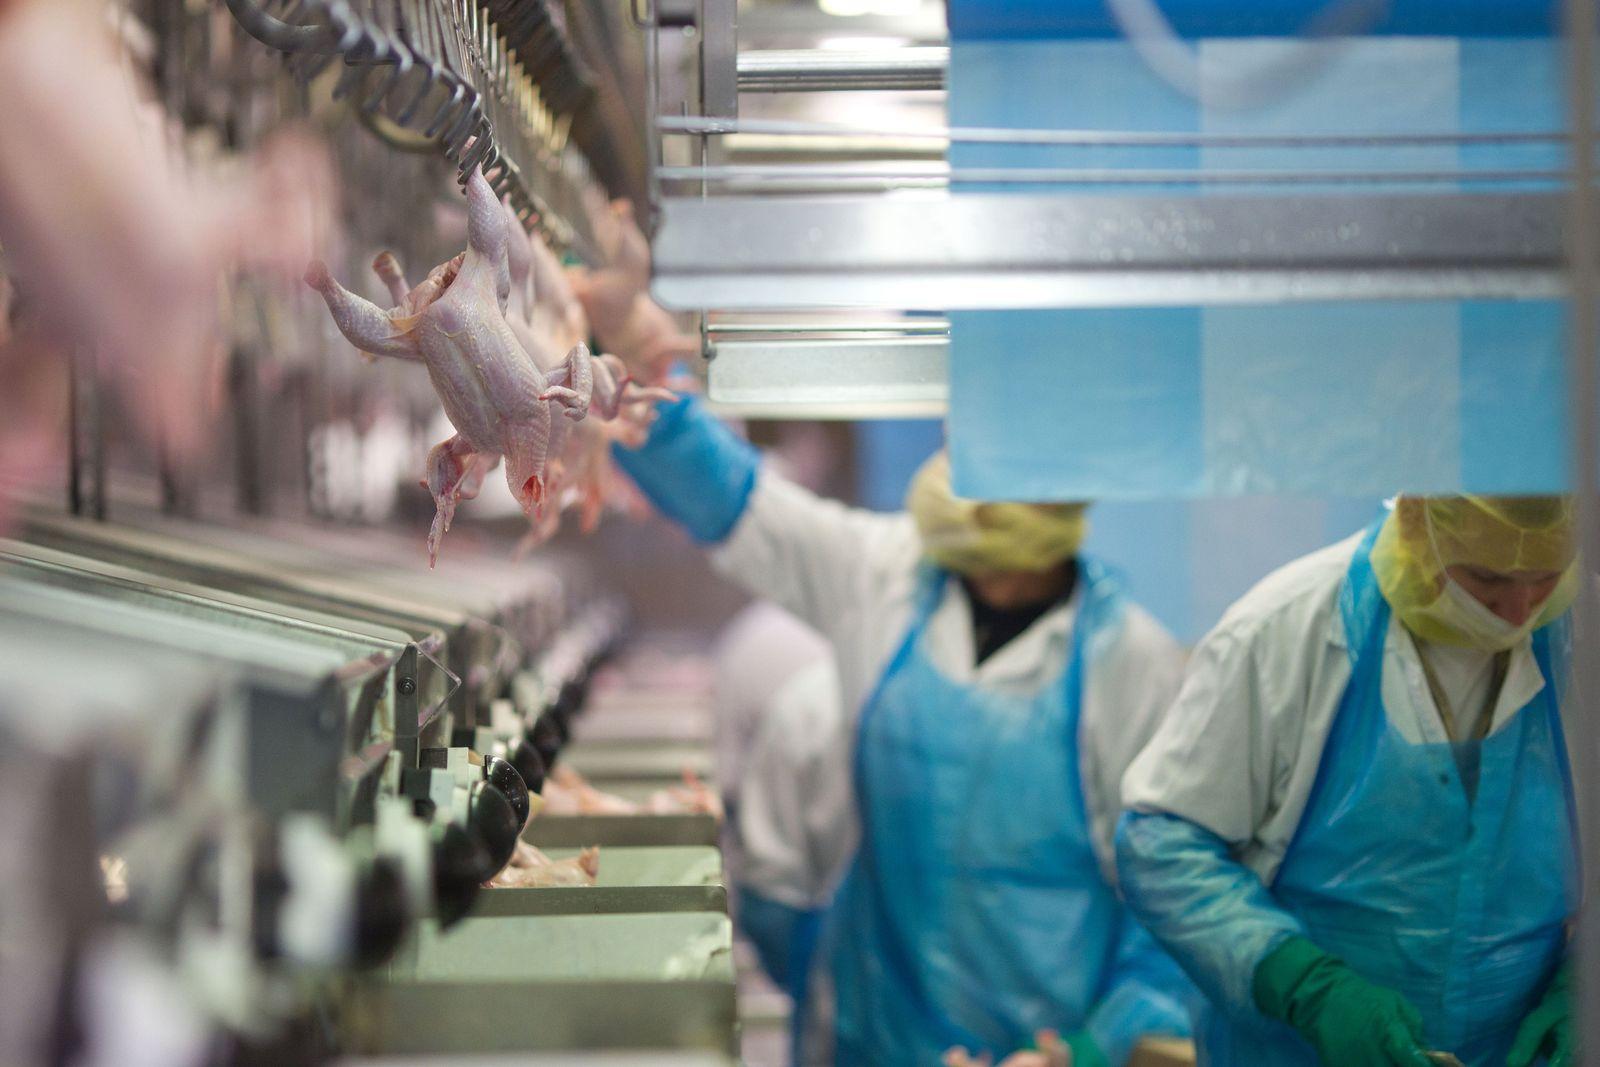 Verbraucher schätzen Lebensmittelrisiken oft falsch ein